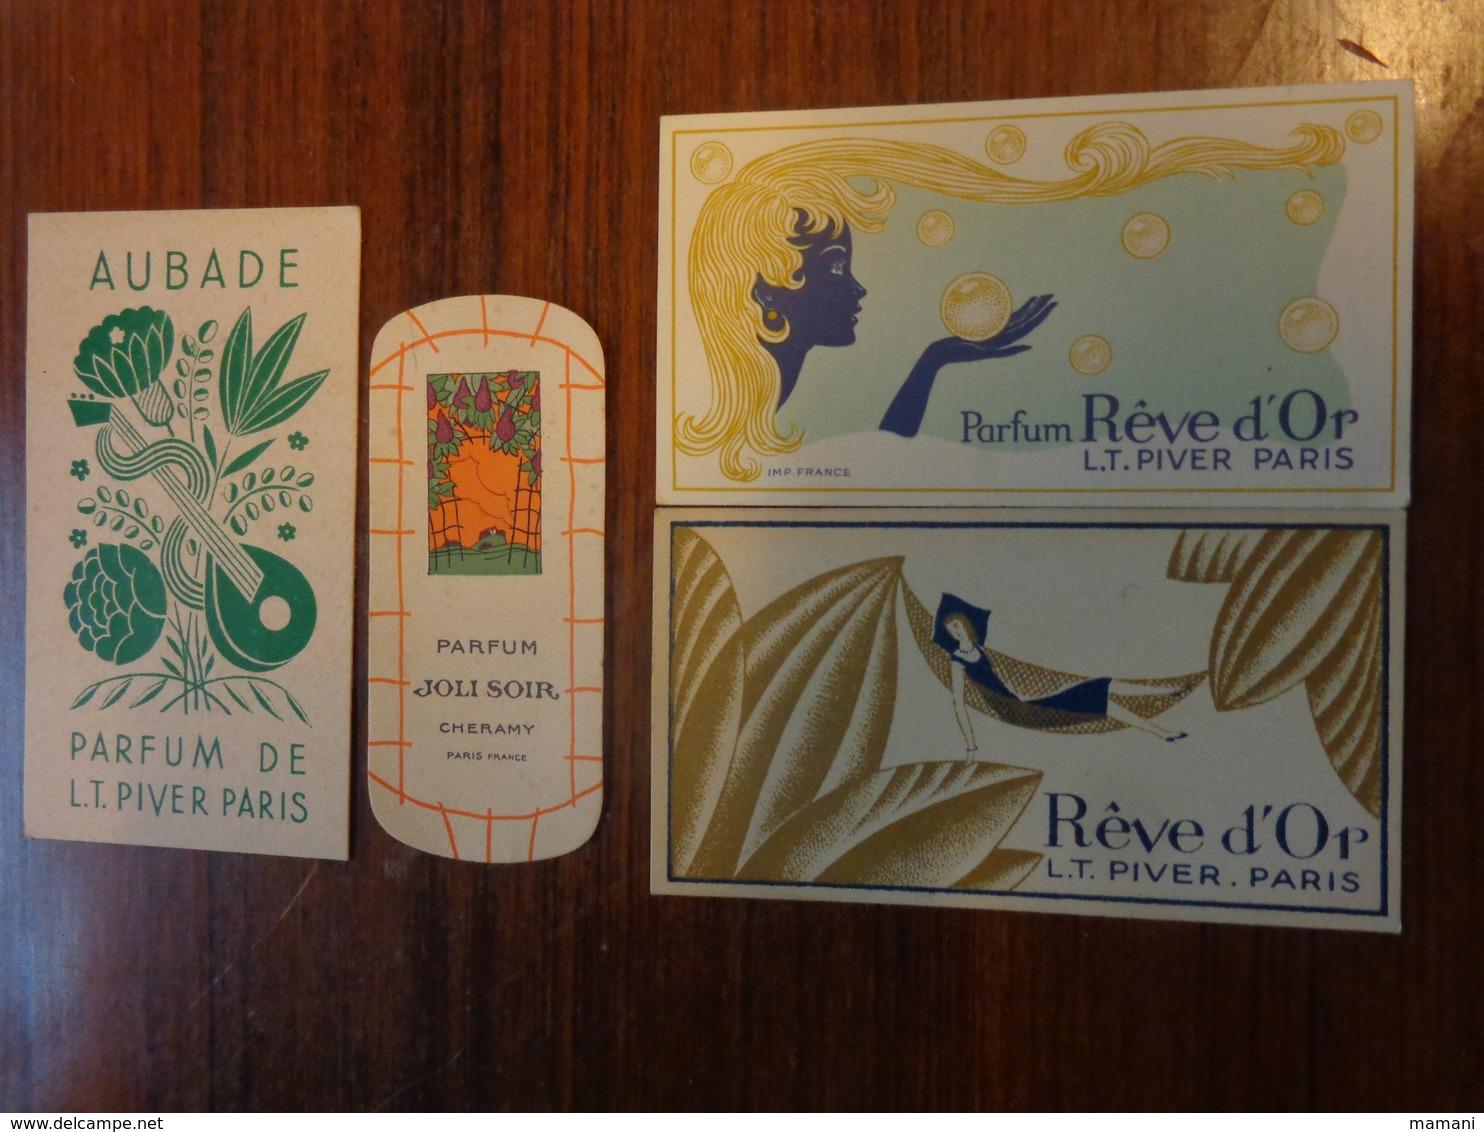 4 Carte Parfumee -parfum Reve D'or-aubade L.t. Piver Paris-joli Soir  Cheramu - Perfume Cards